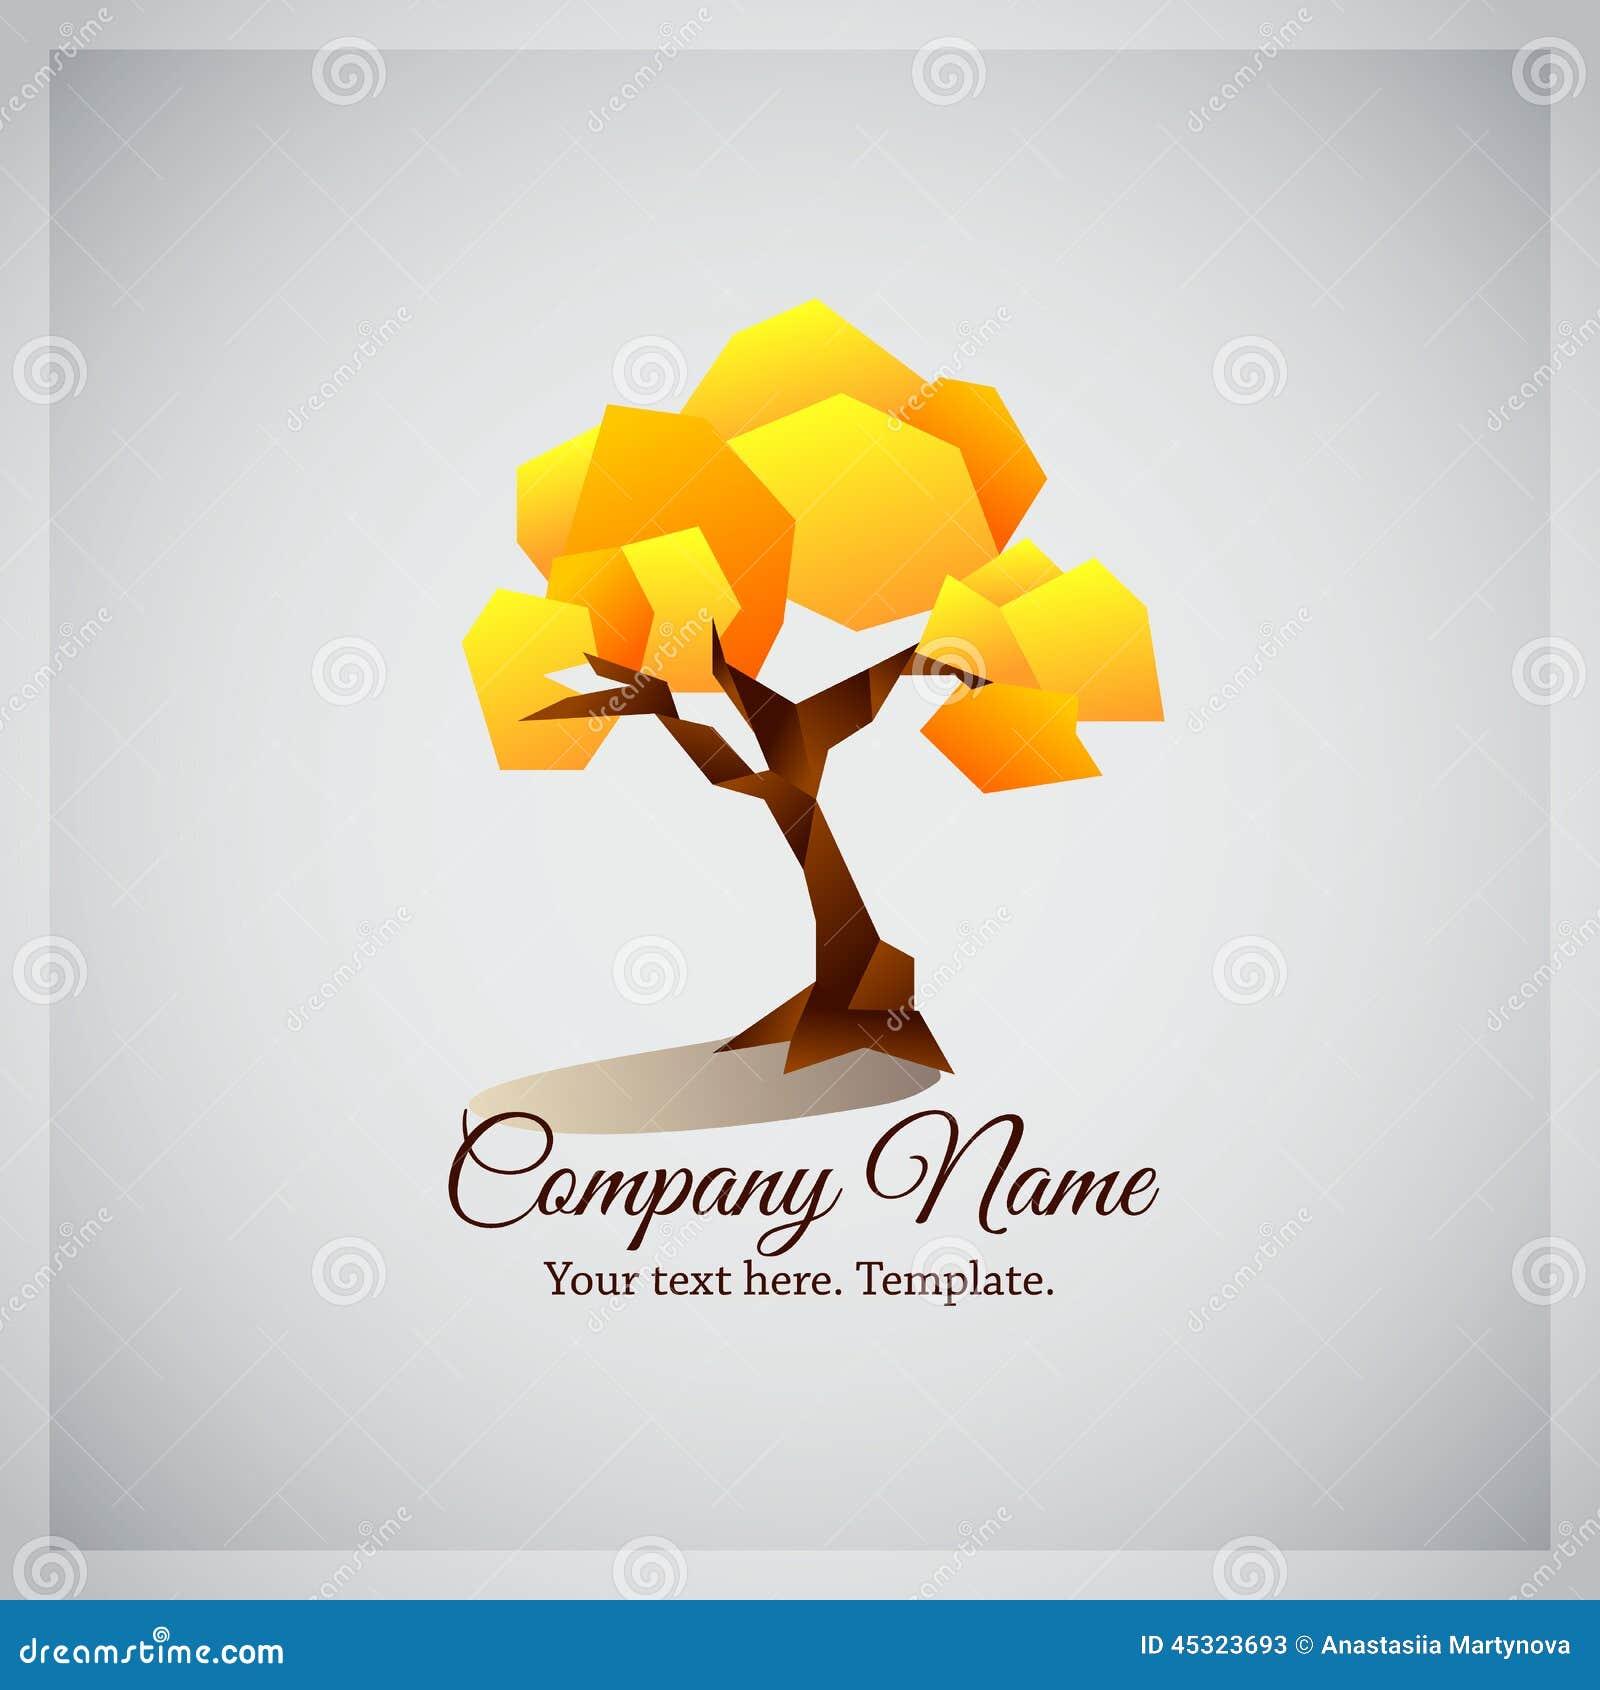 Company Business Logo With Geometric Yellow Tree Stock ...